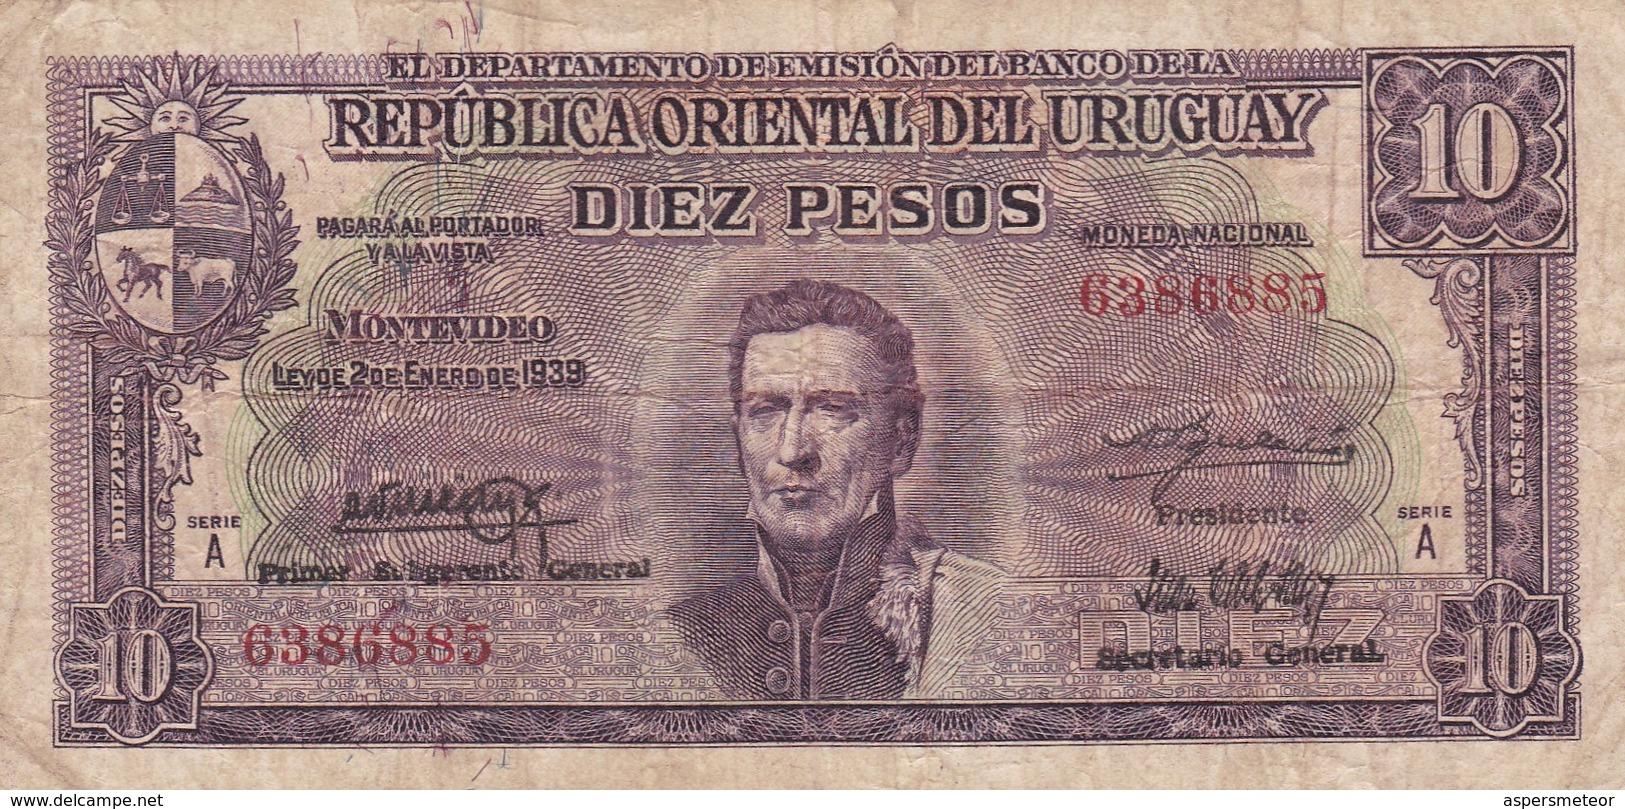 DIEZ PESOS SERIE A URUGUAY CIRCA 1940s-BILLETE BANKNOTE BILLET-BLEUP - Uruguay